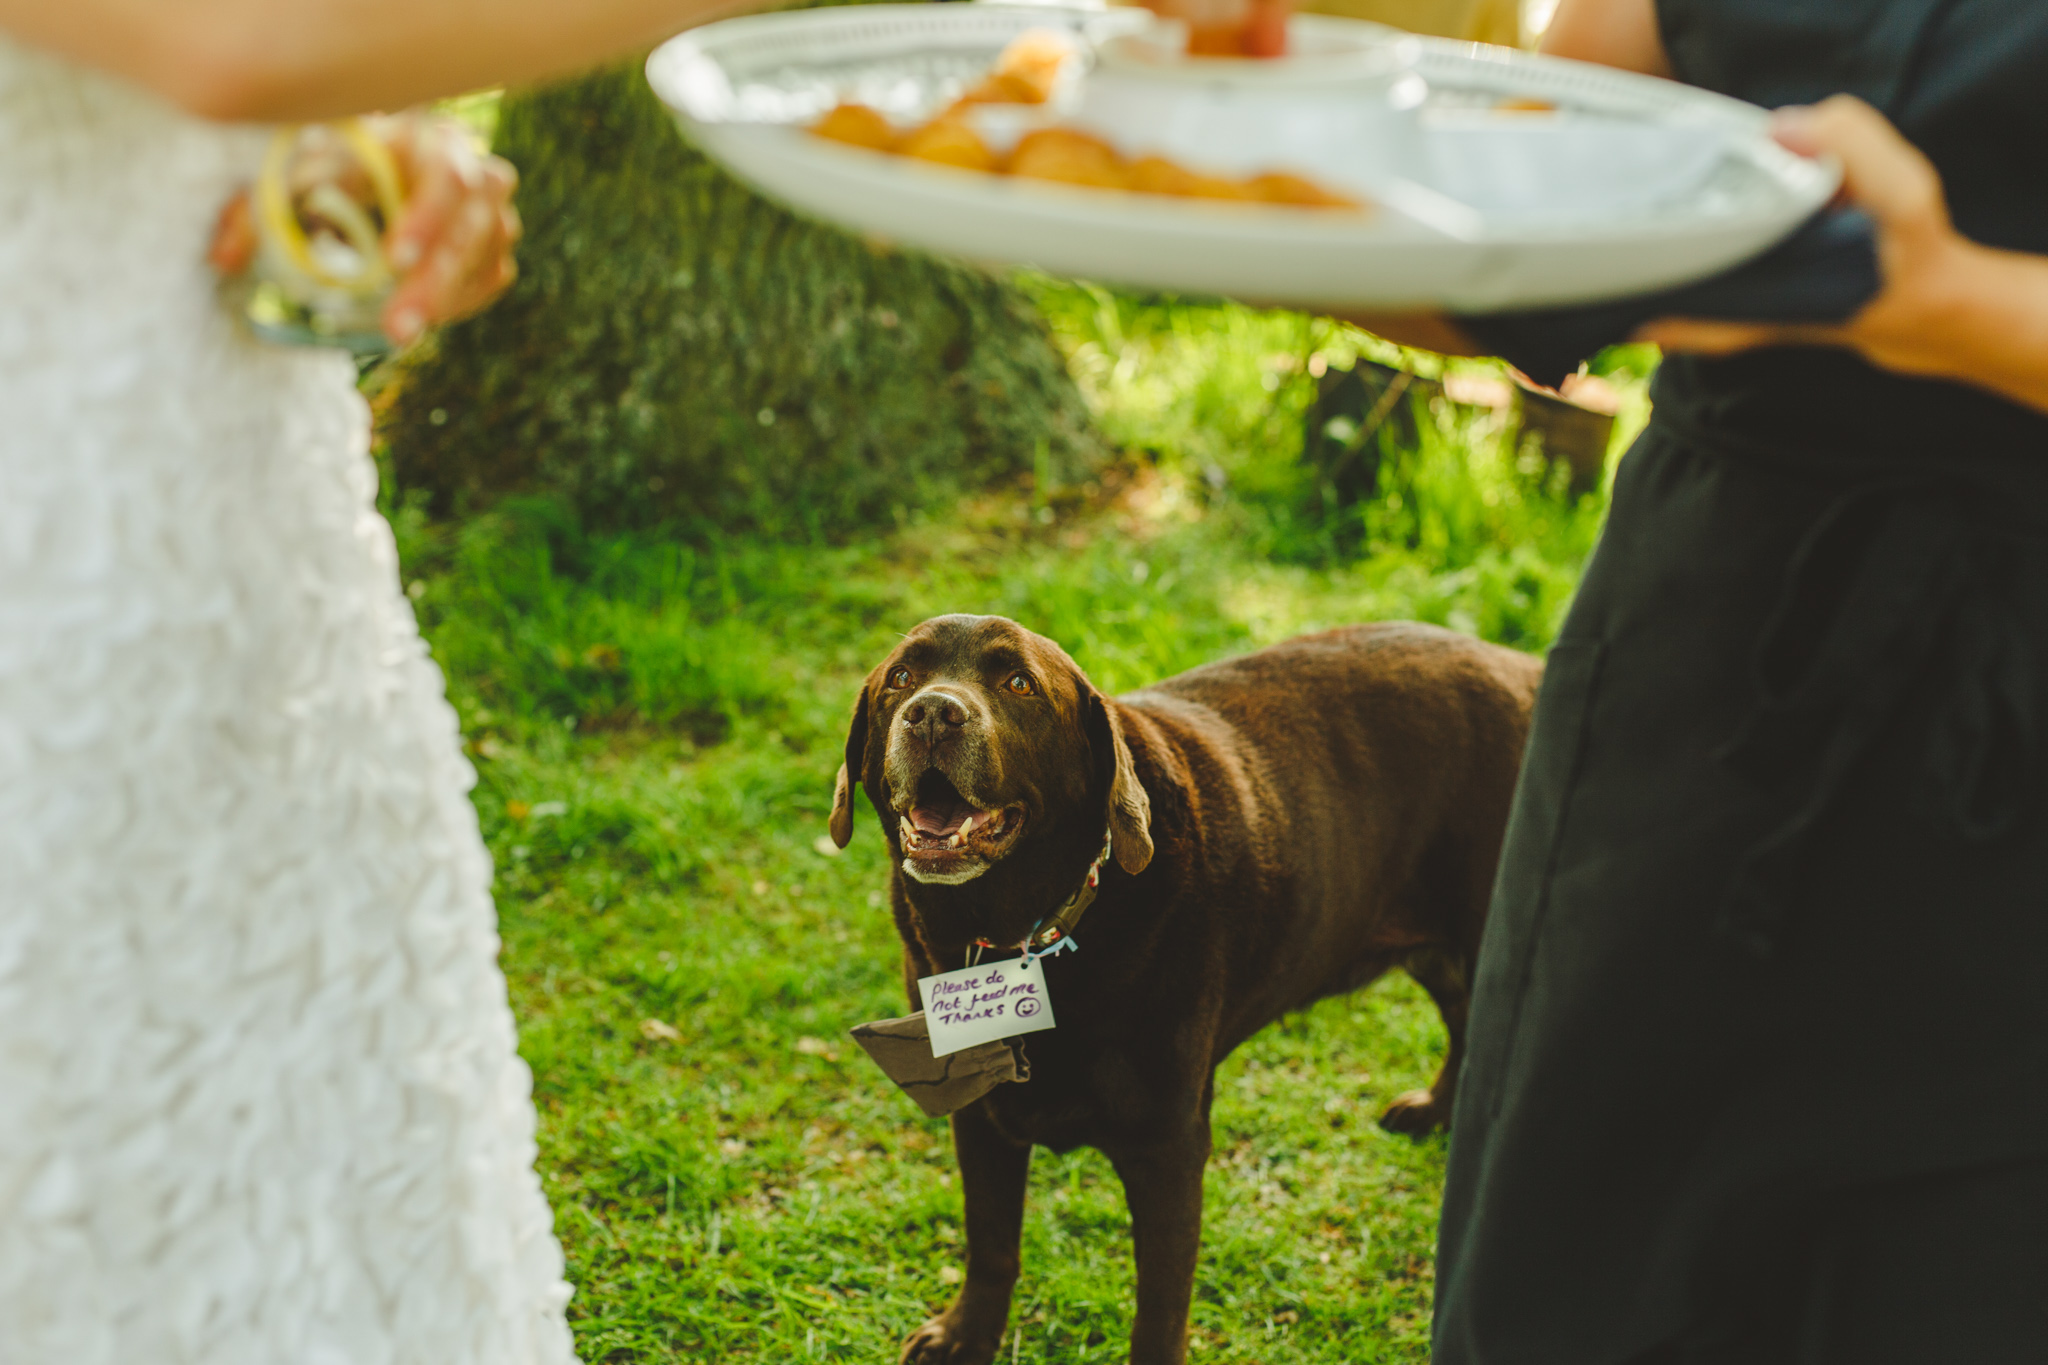 derbyshire-wedding-photographer-videographer-camera-hannah-5.jpg